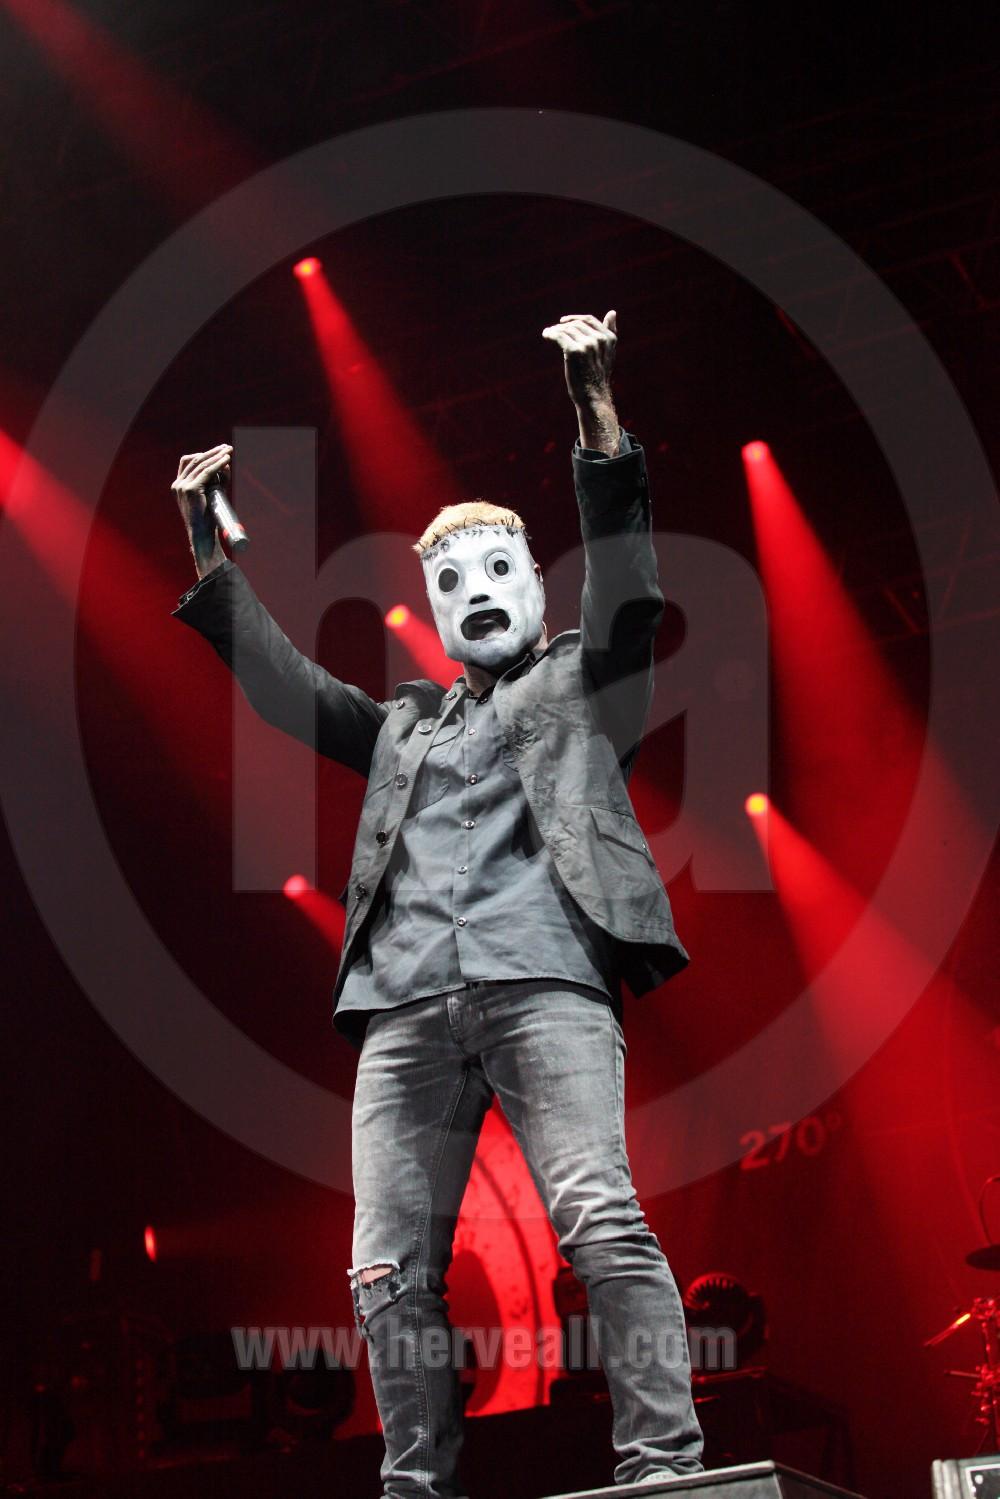 Slipknots Clown recalls Iowa recording sessions: We